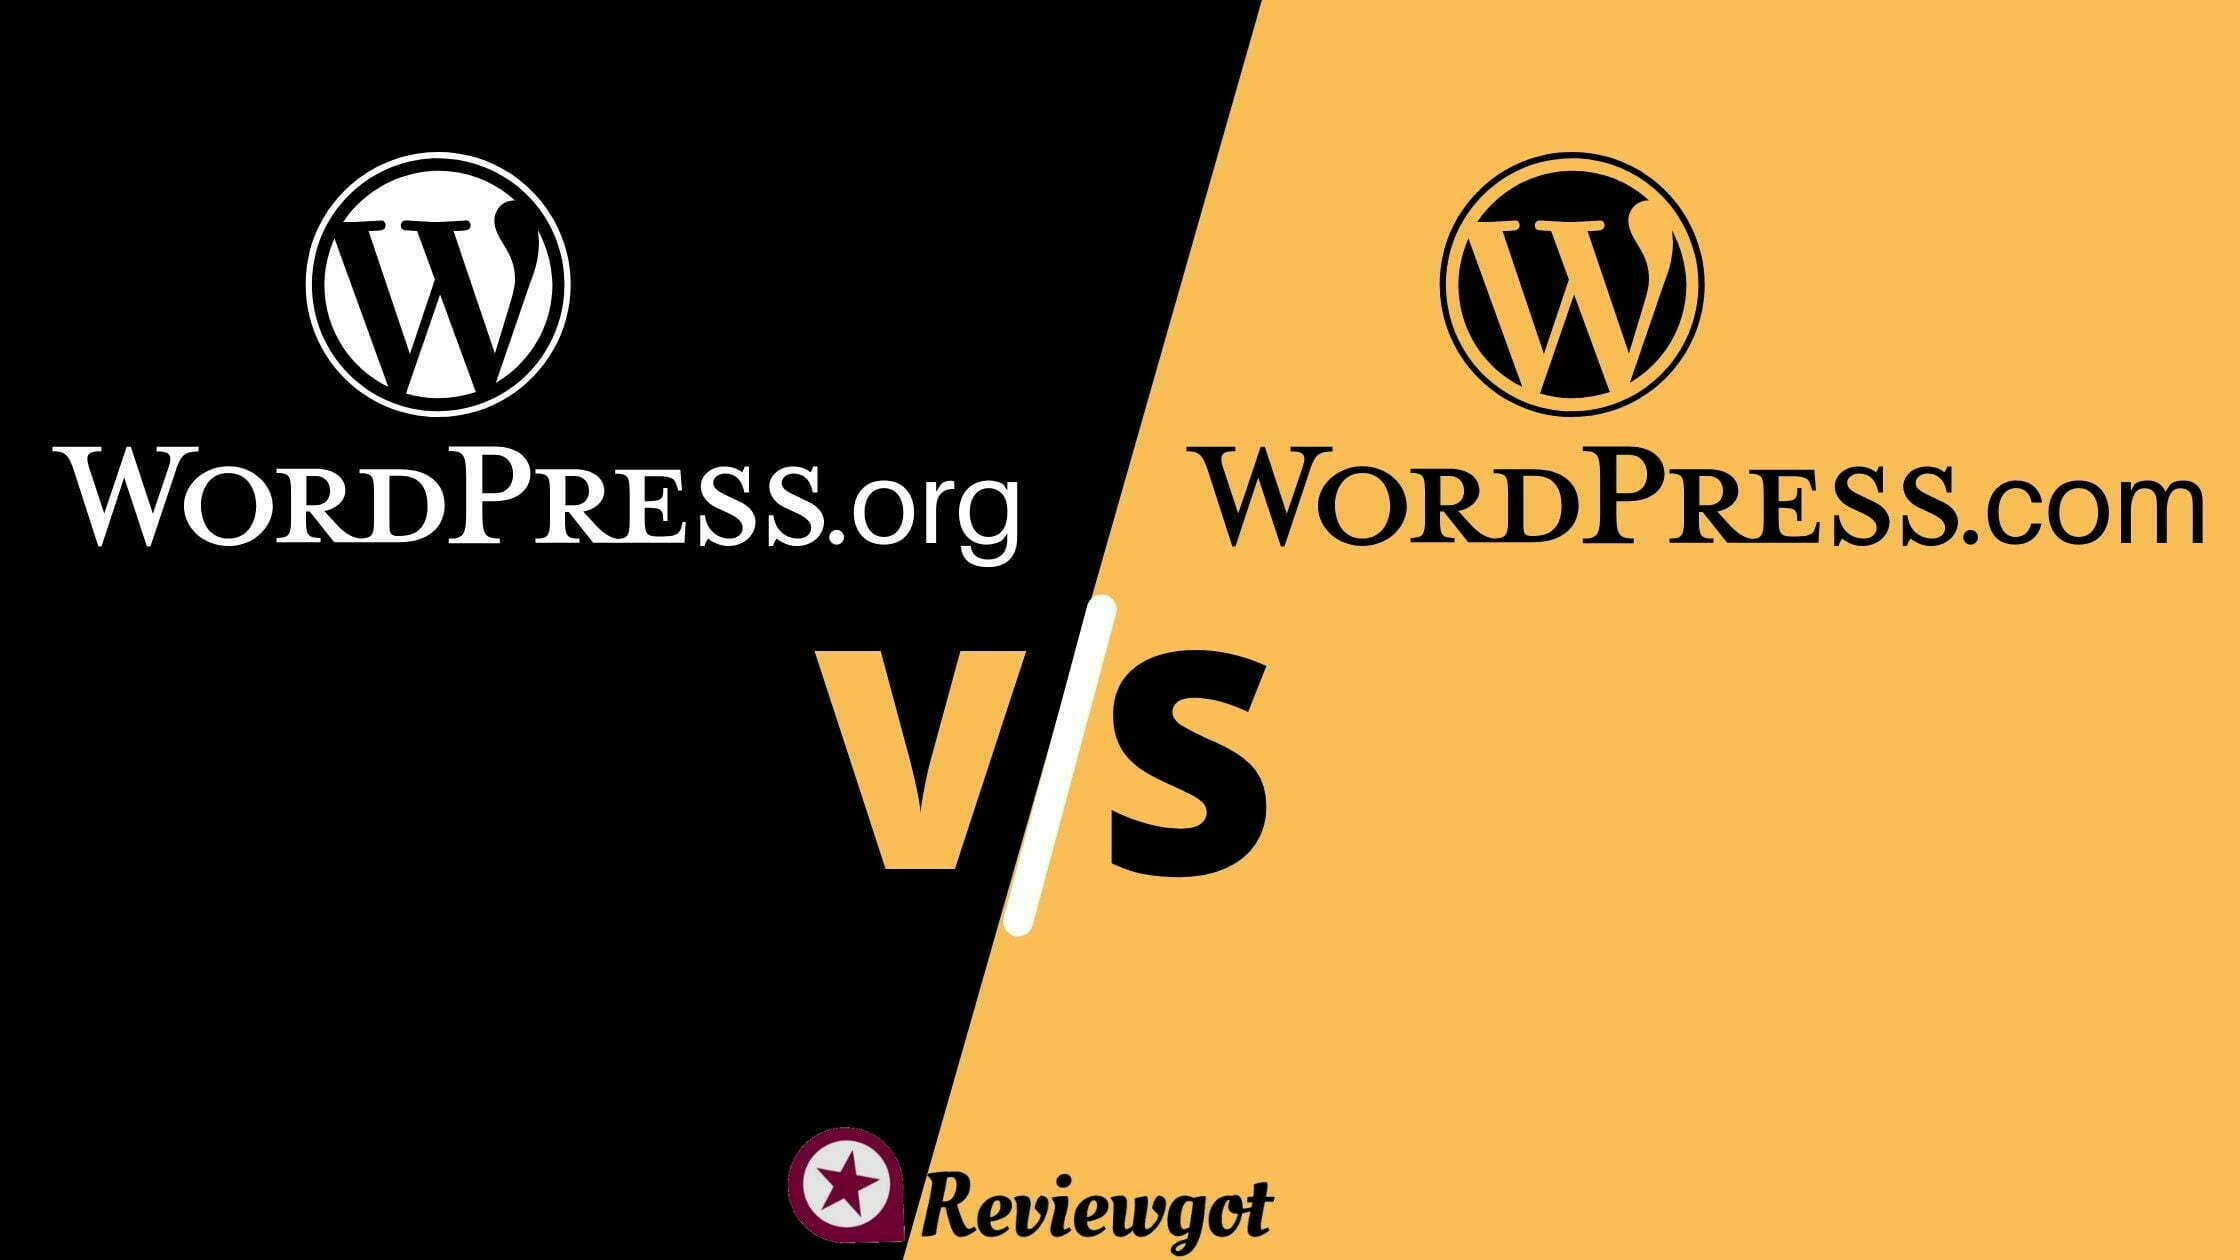 WordPress.org VS WordPress.com Which Better?